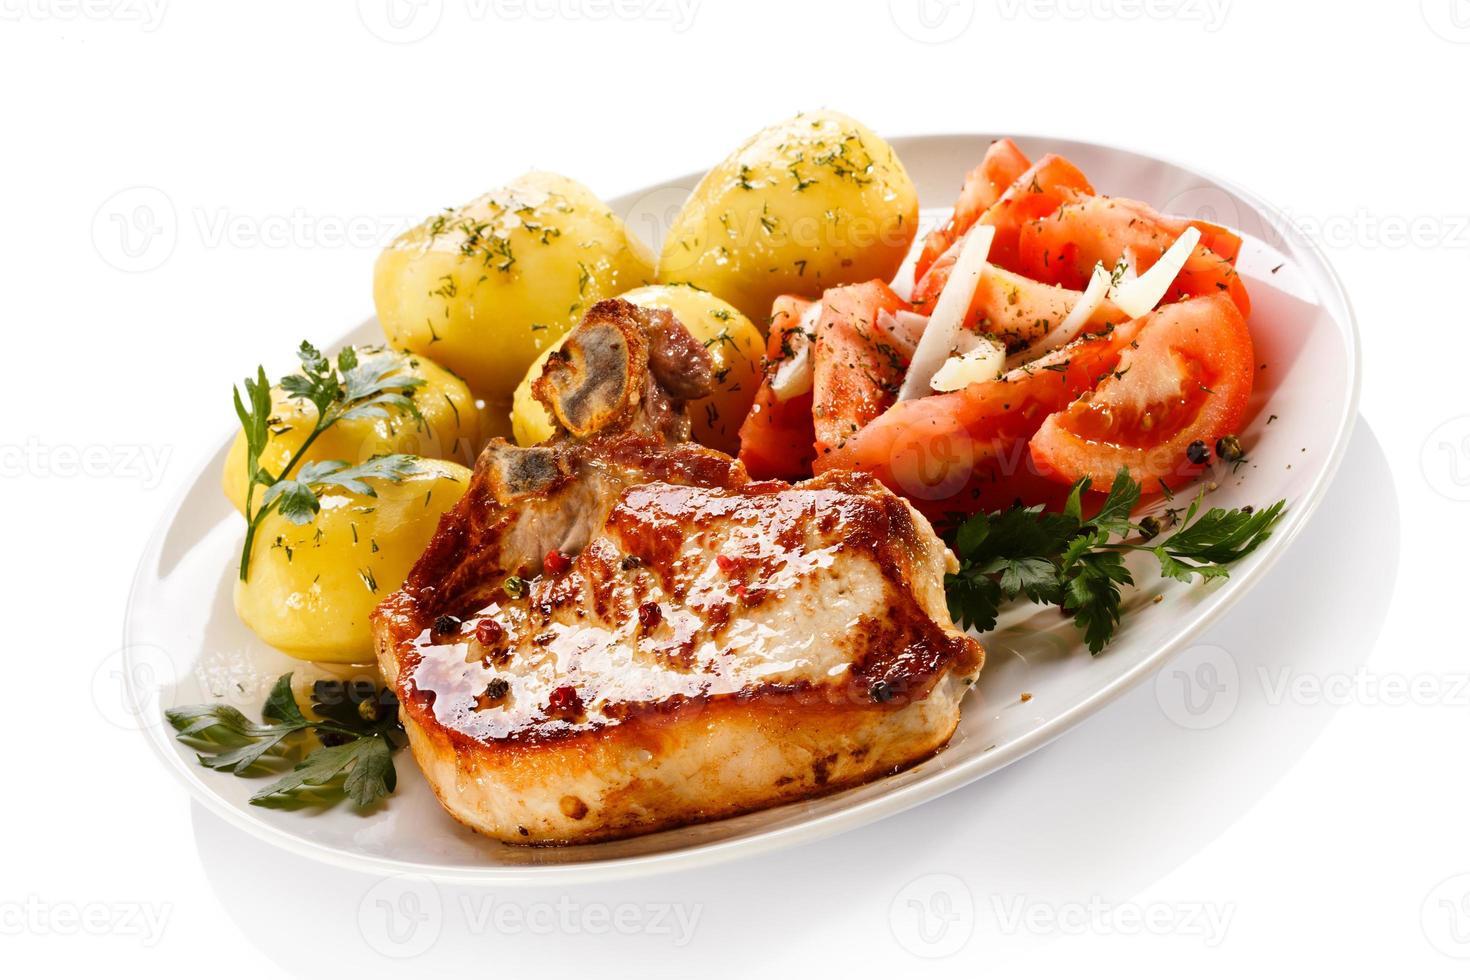 braciola di maiale, patate bollite e verdure su sfondo bianco foto